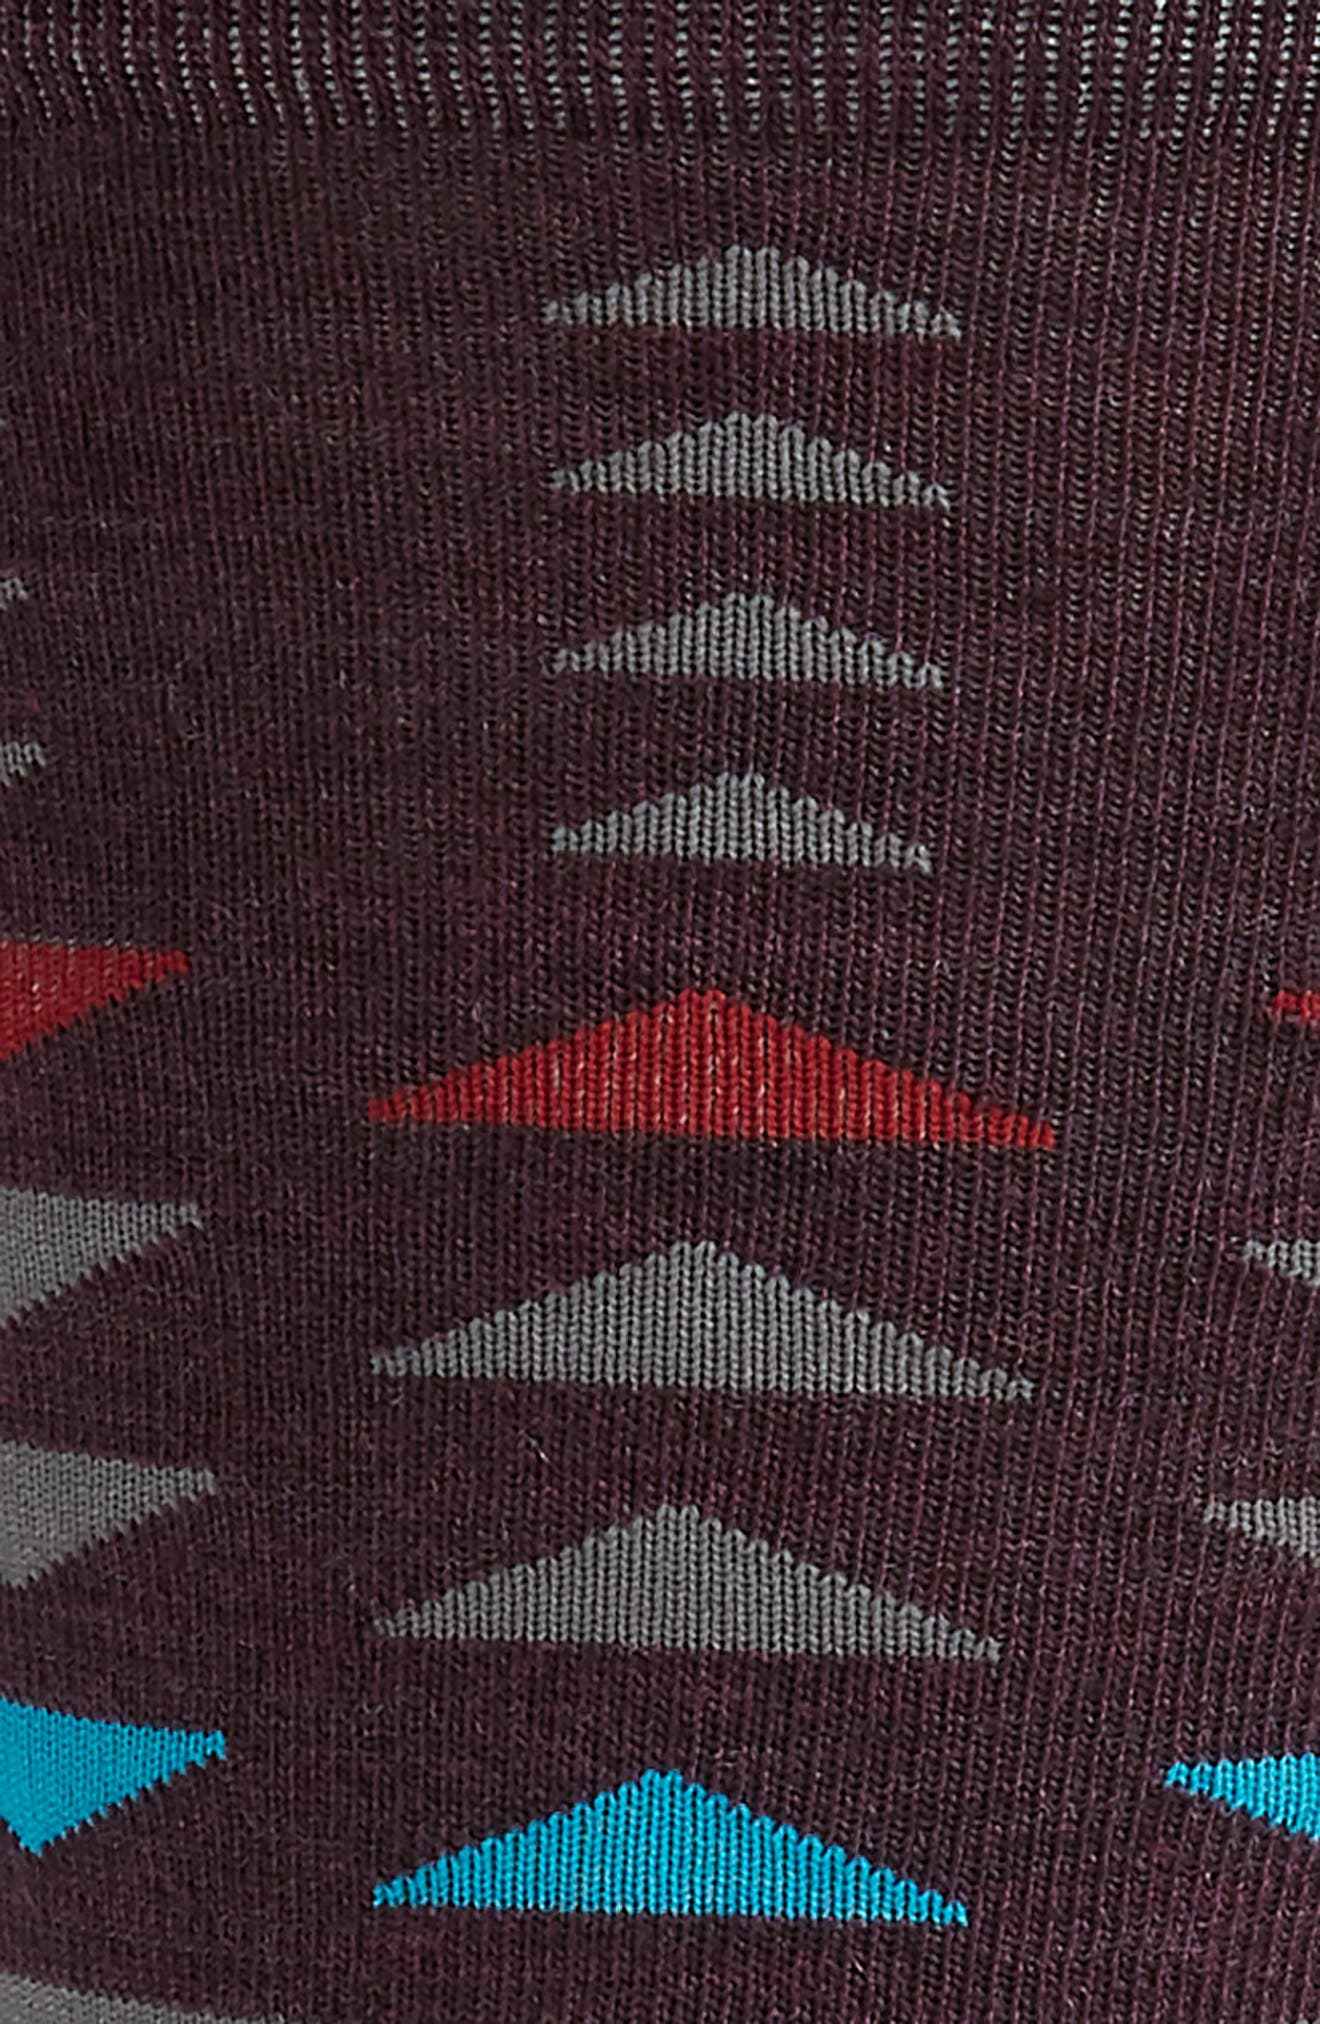 Burgee Geometric Socks,                             Alternate thumbnail 2, color,                             BORDEAUX HEATHER